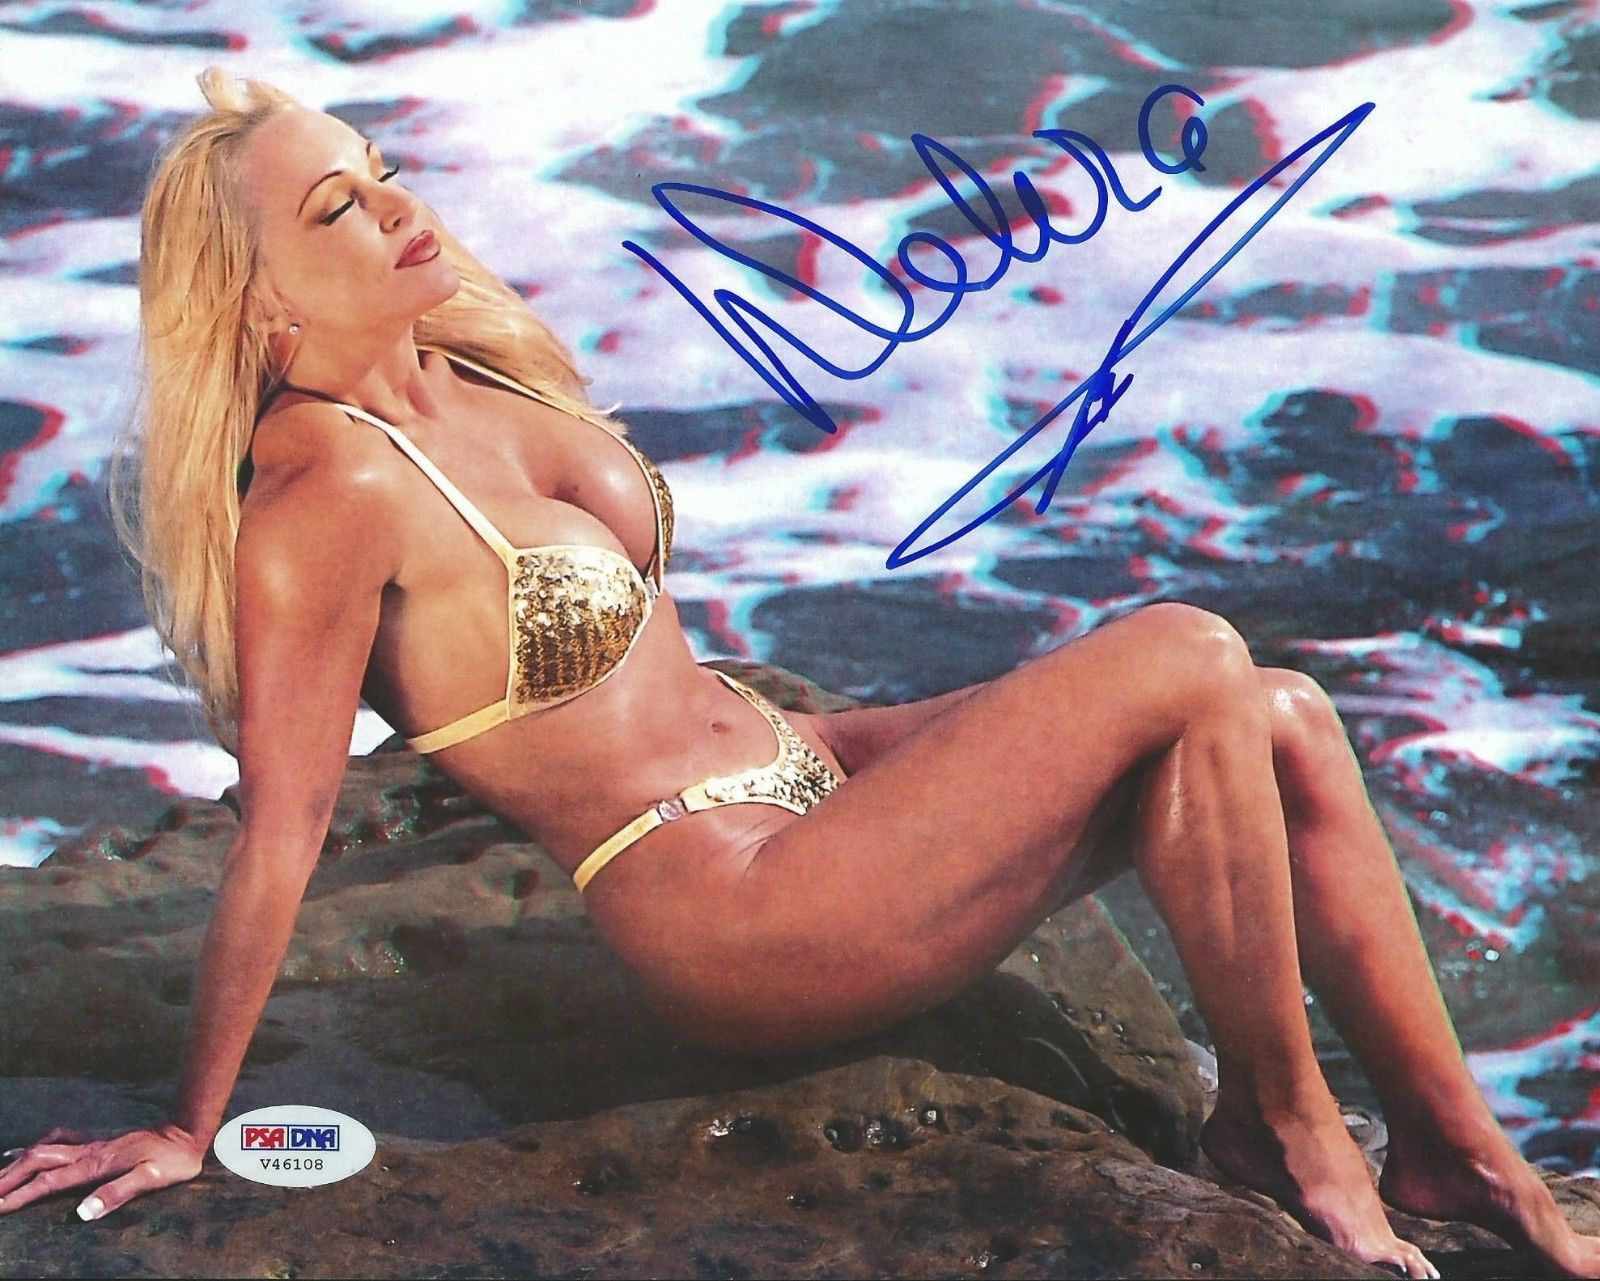 High Quality Autograph - Gold Bikini